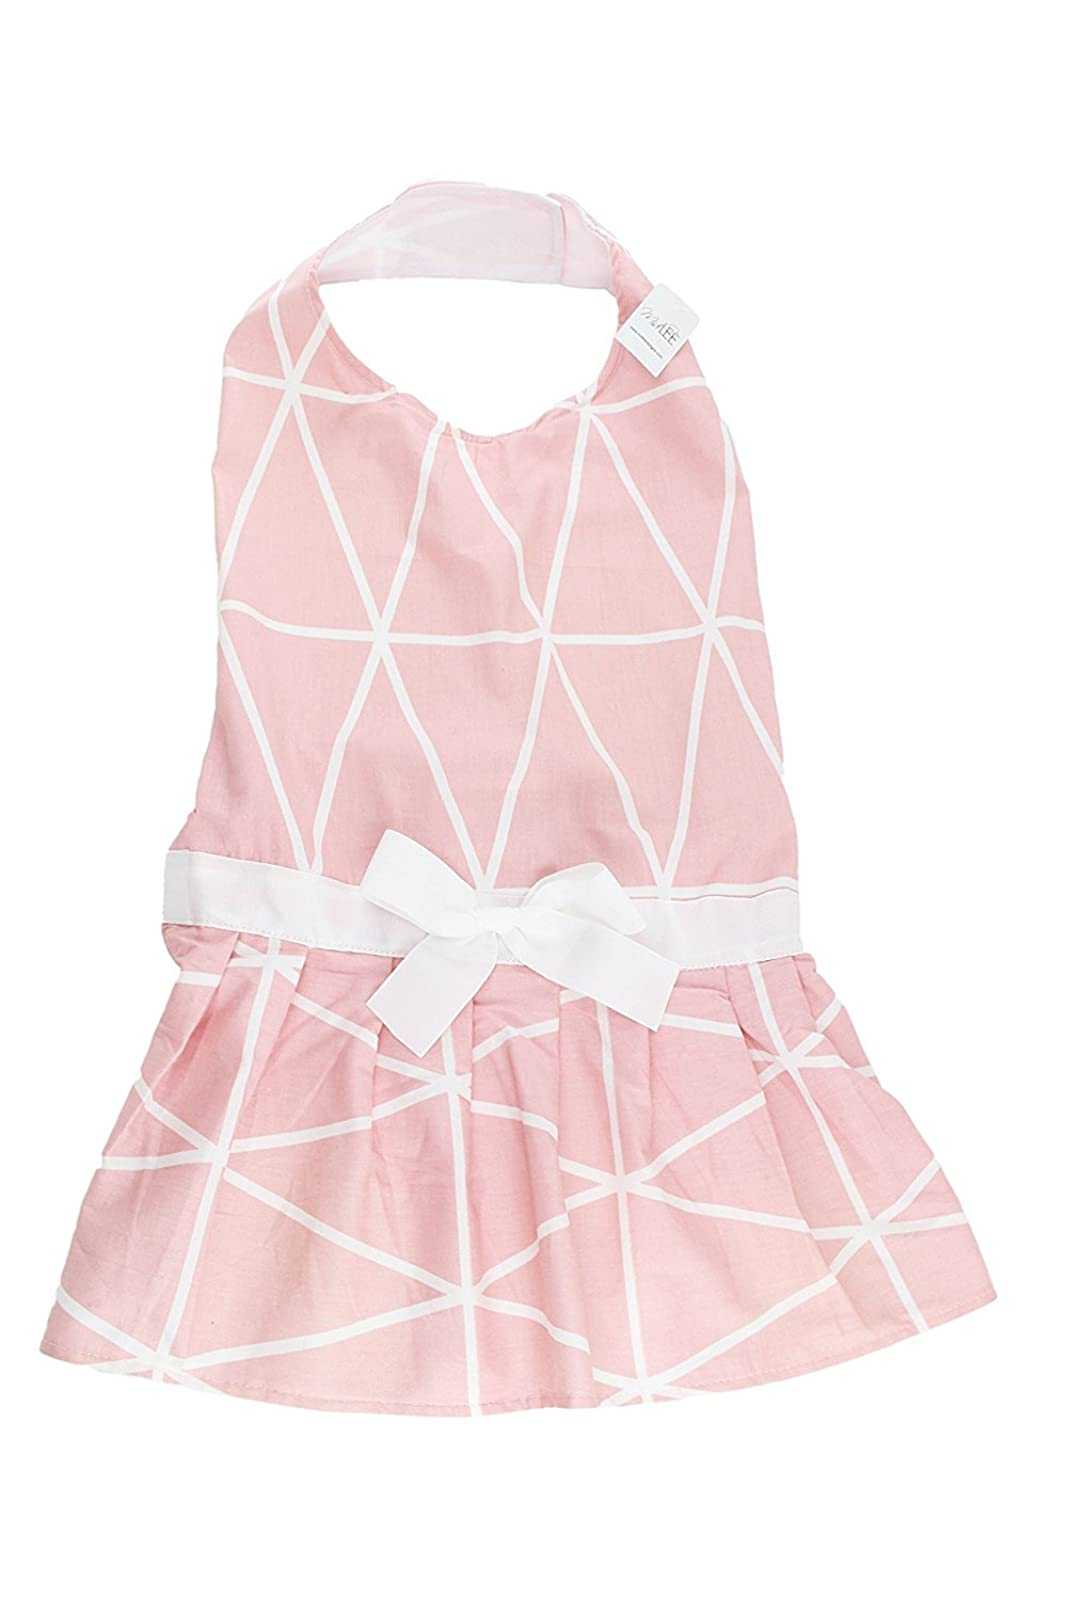 Midlee Pink Geometric Big Dog Dress by (X-Large) XXL - 2